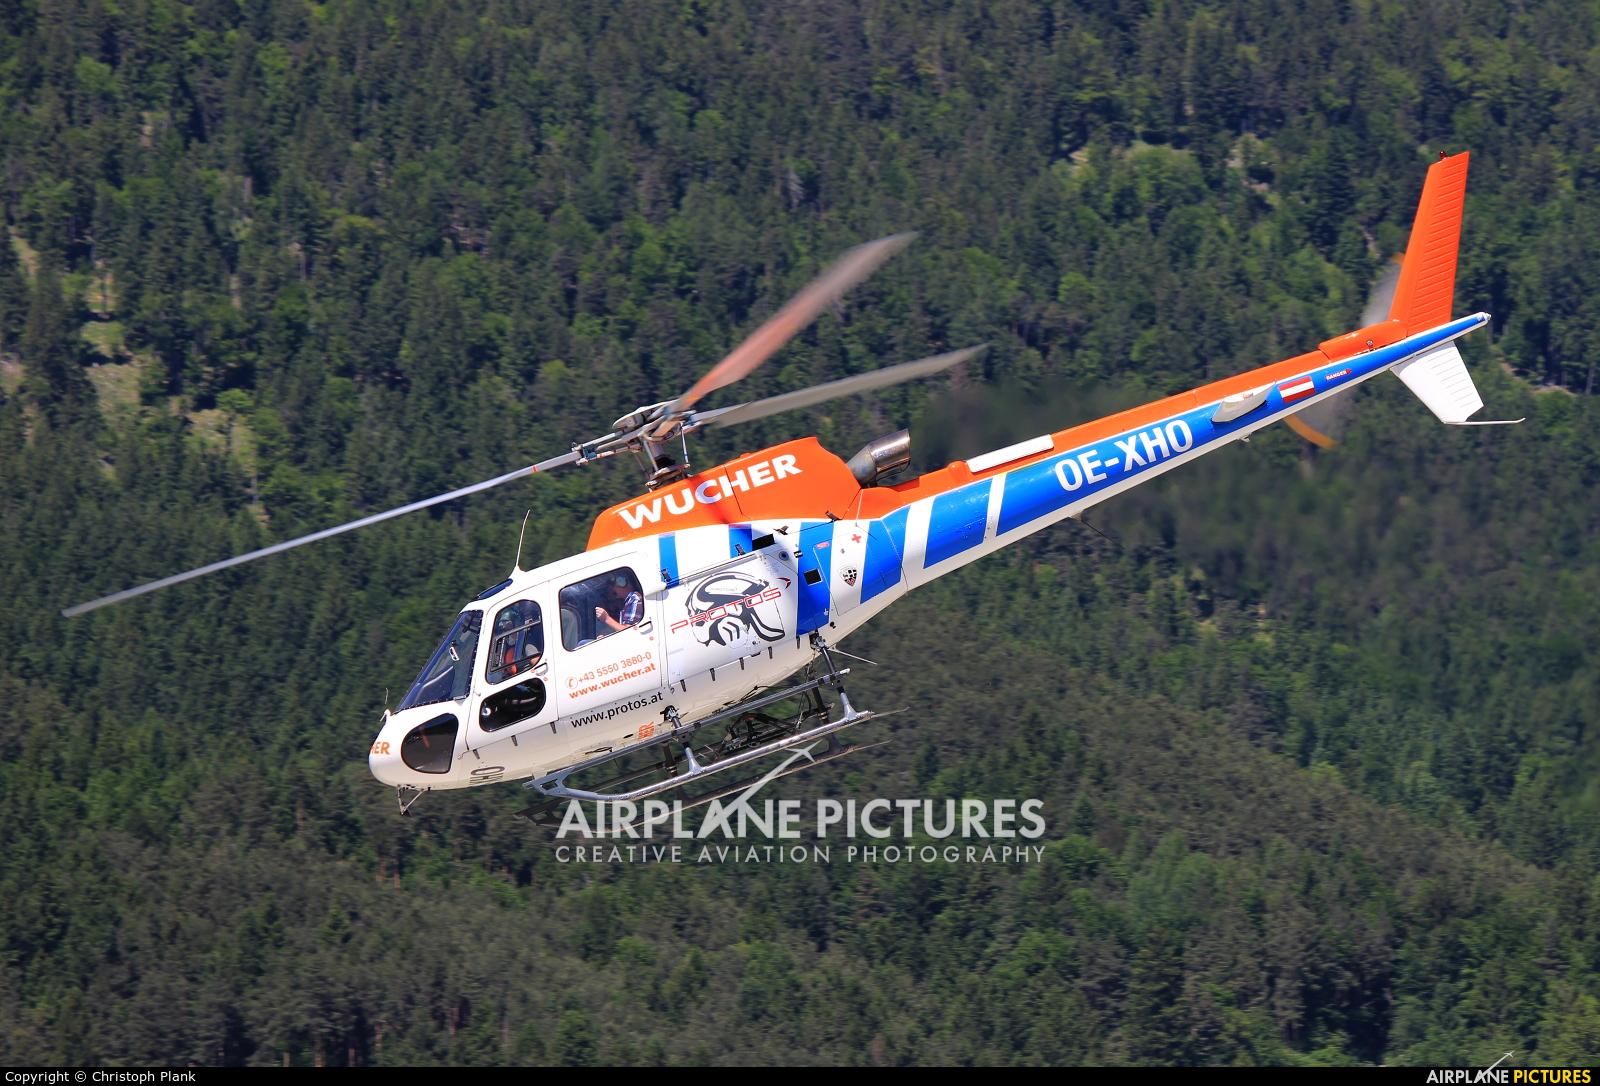 Wucher Helicopter OE-XHO aircraft at Innsbruck